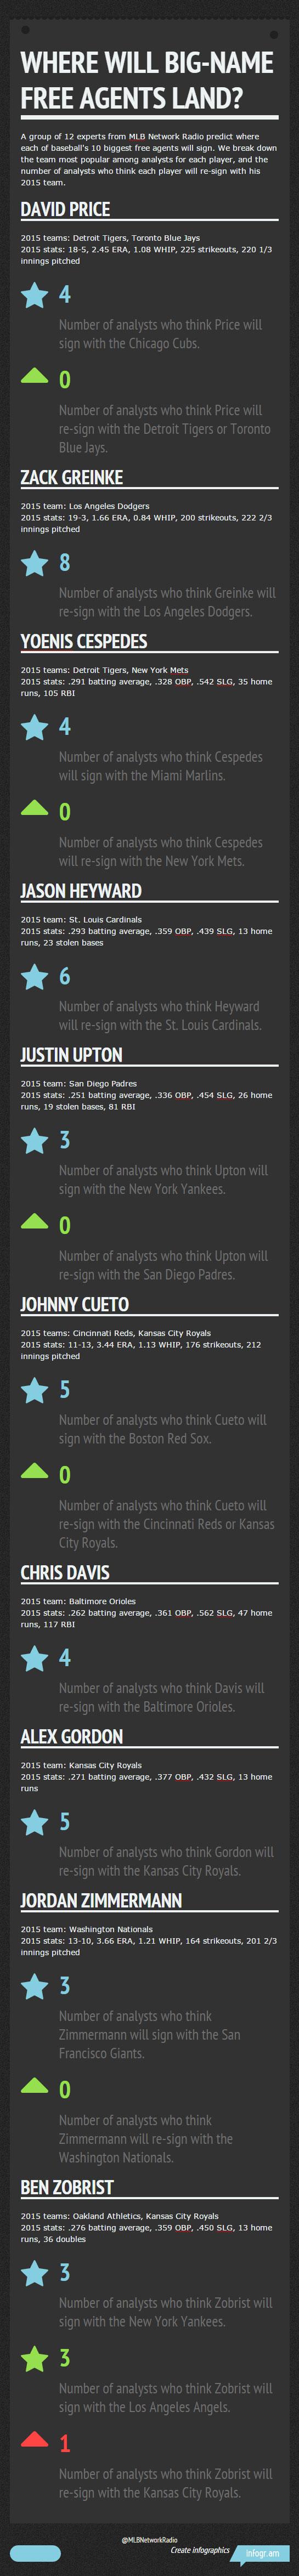 2016 free agent predictions